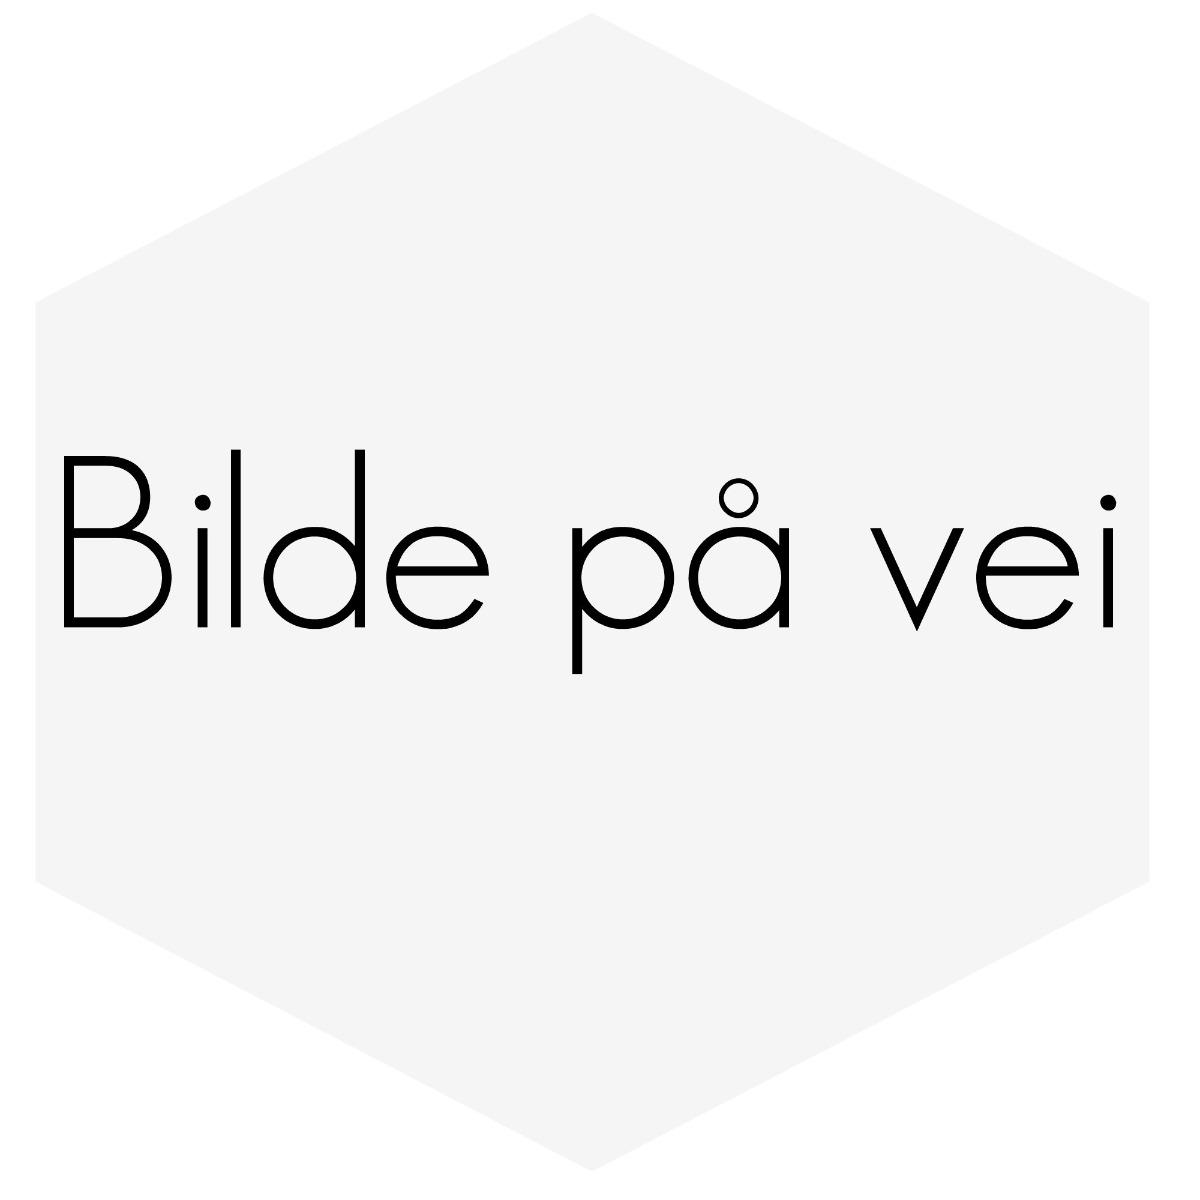 "SILIKONSLANGE RØD REDUSERING 2,25-2,5"" (57-63MM)"